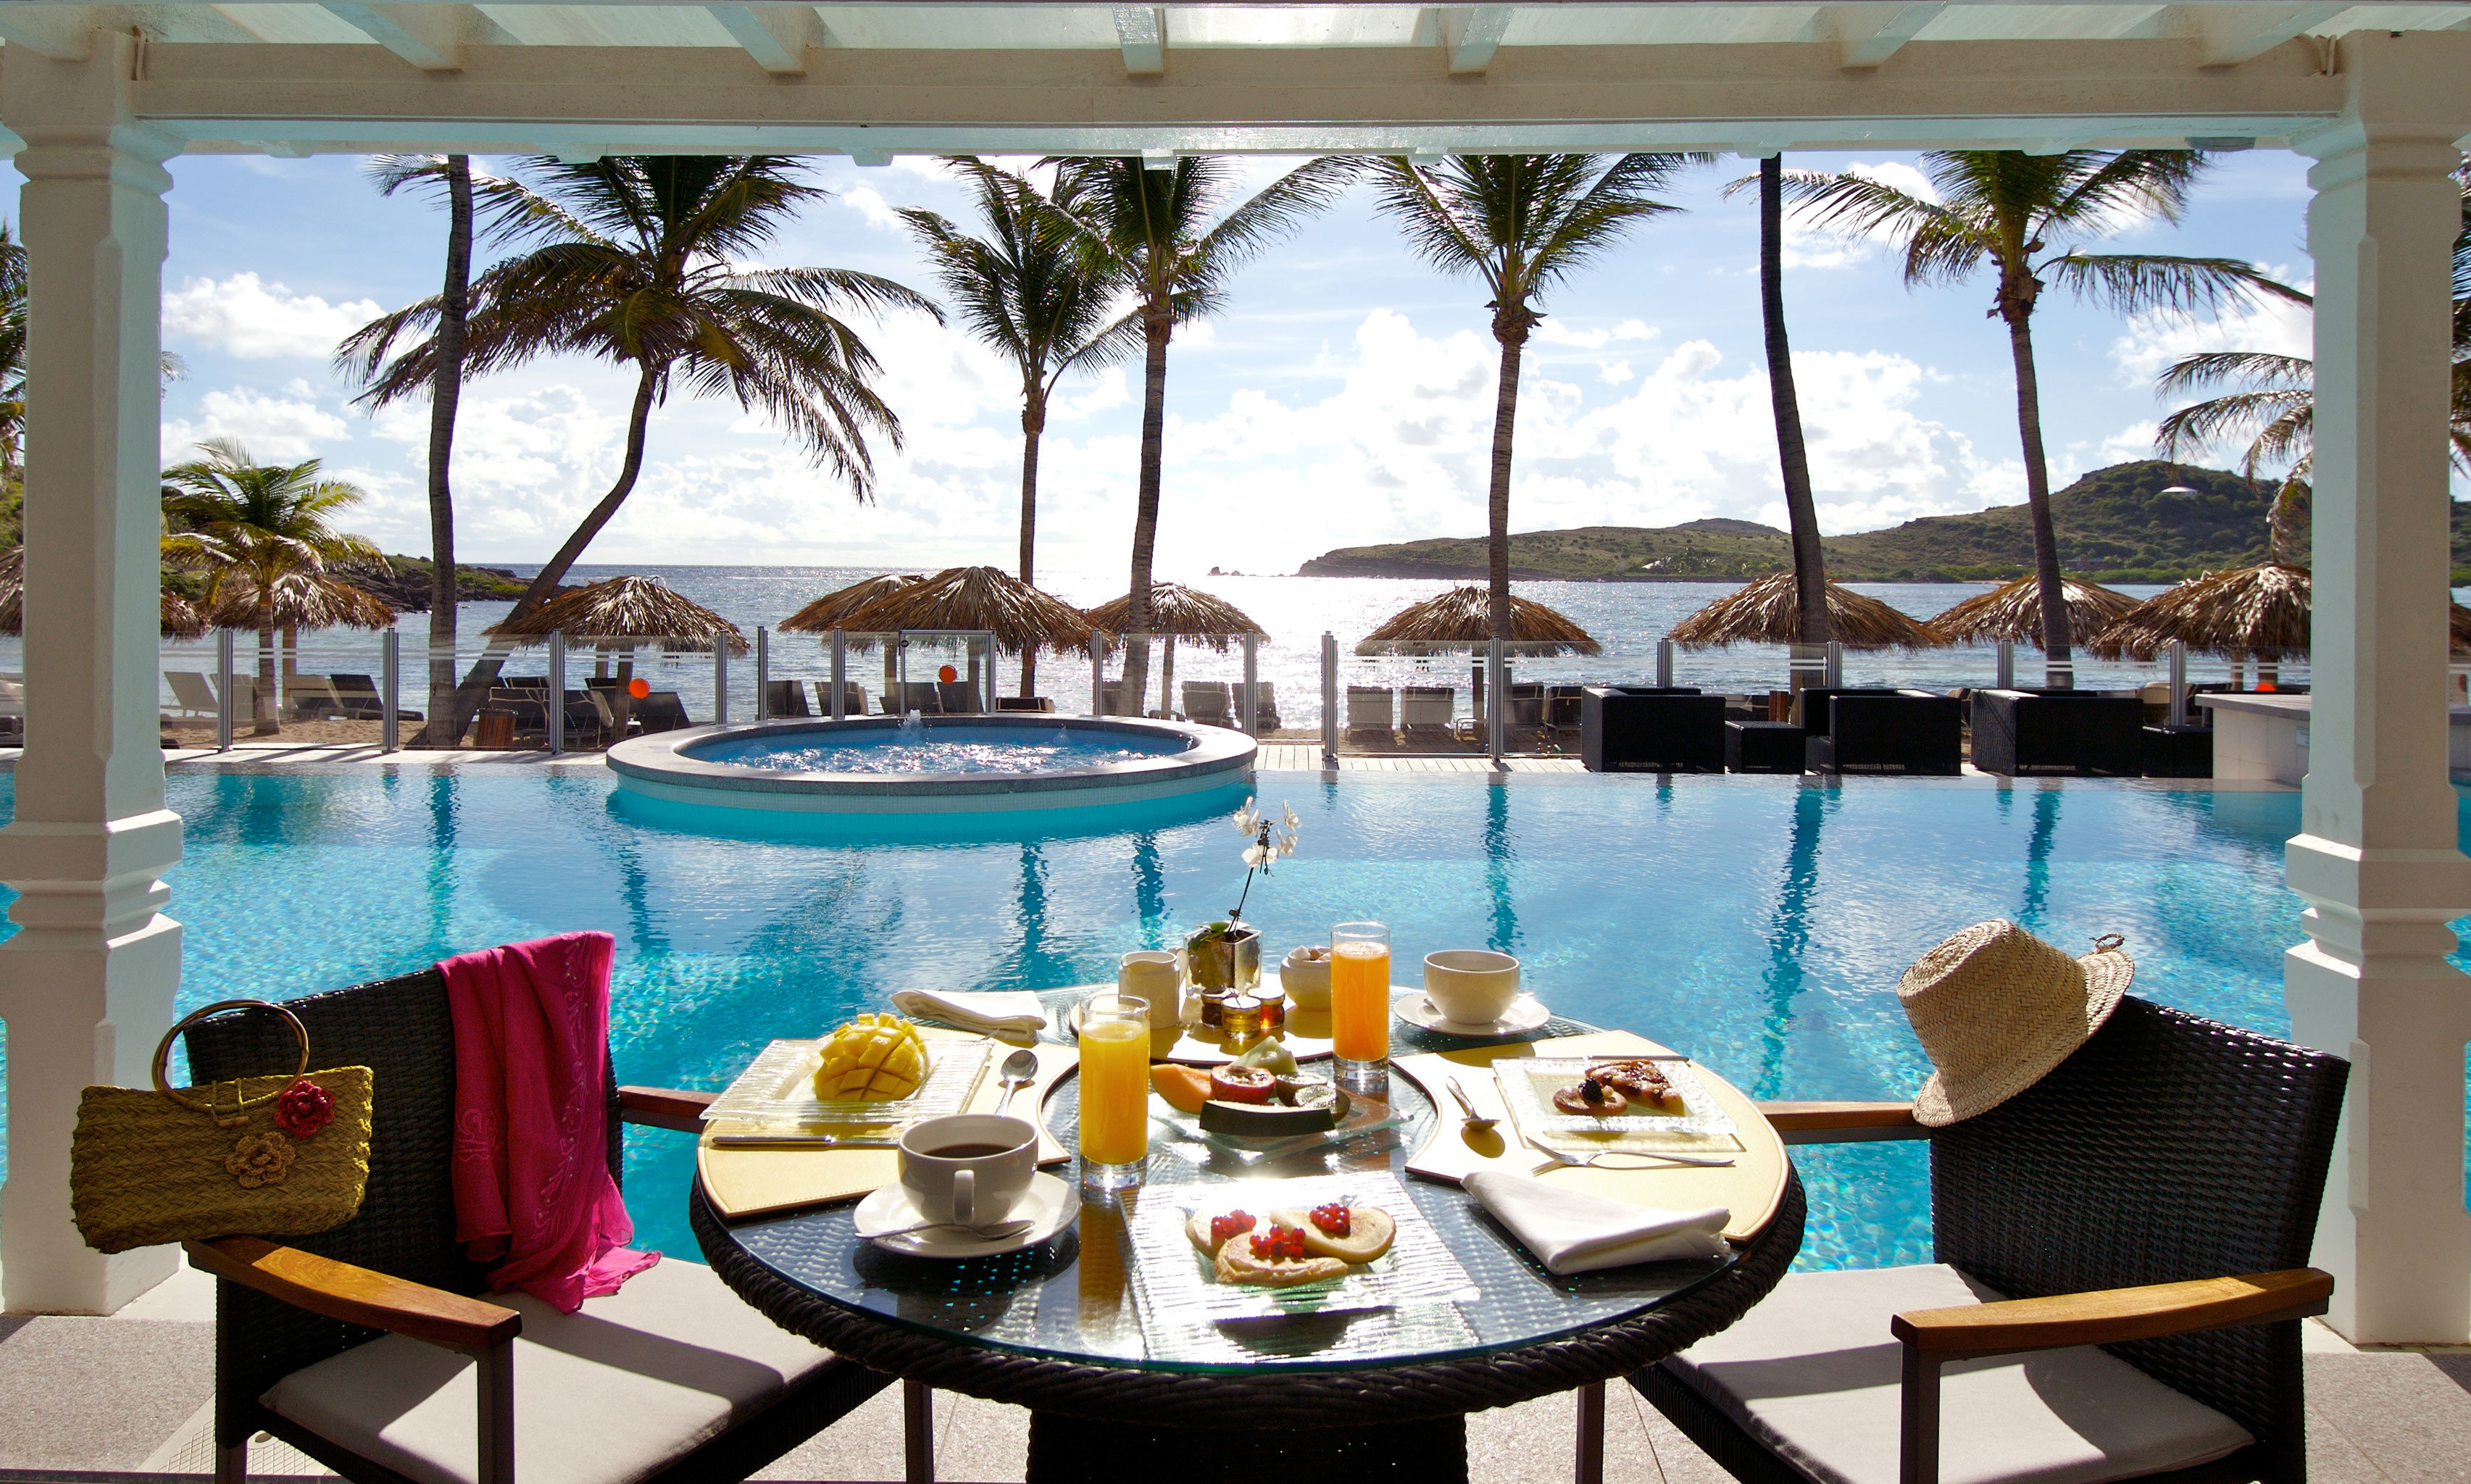 Drink Eat Lounge Pool leisure property Resort swimming pool restaurant condominium Villa caribbean overlooking